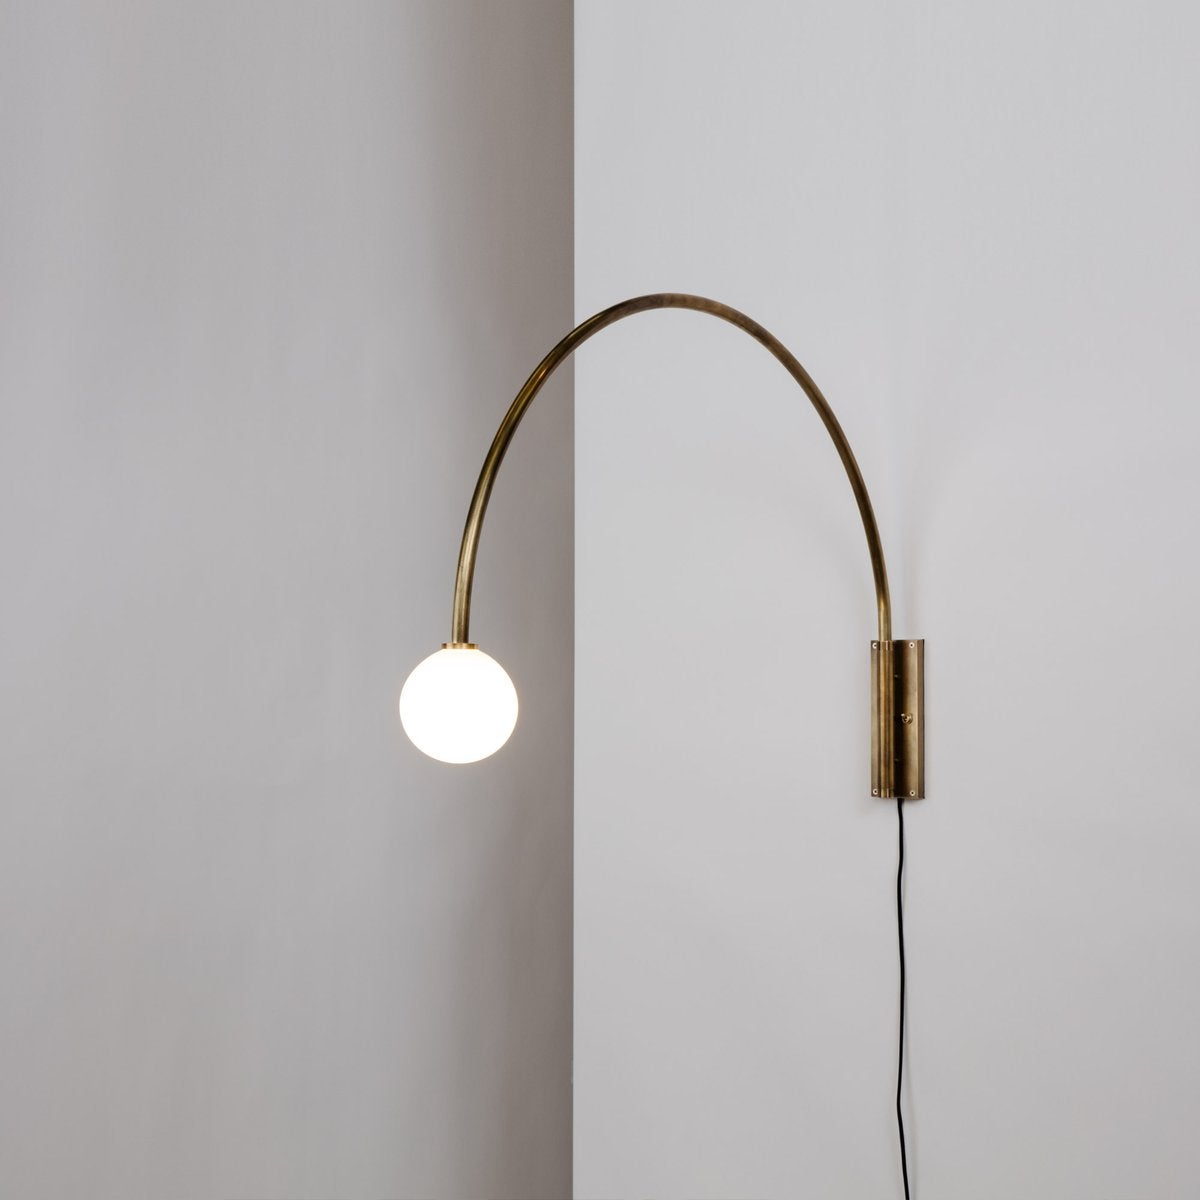 contourwalllamp-2_1200x1200